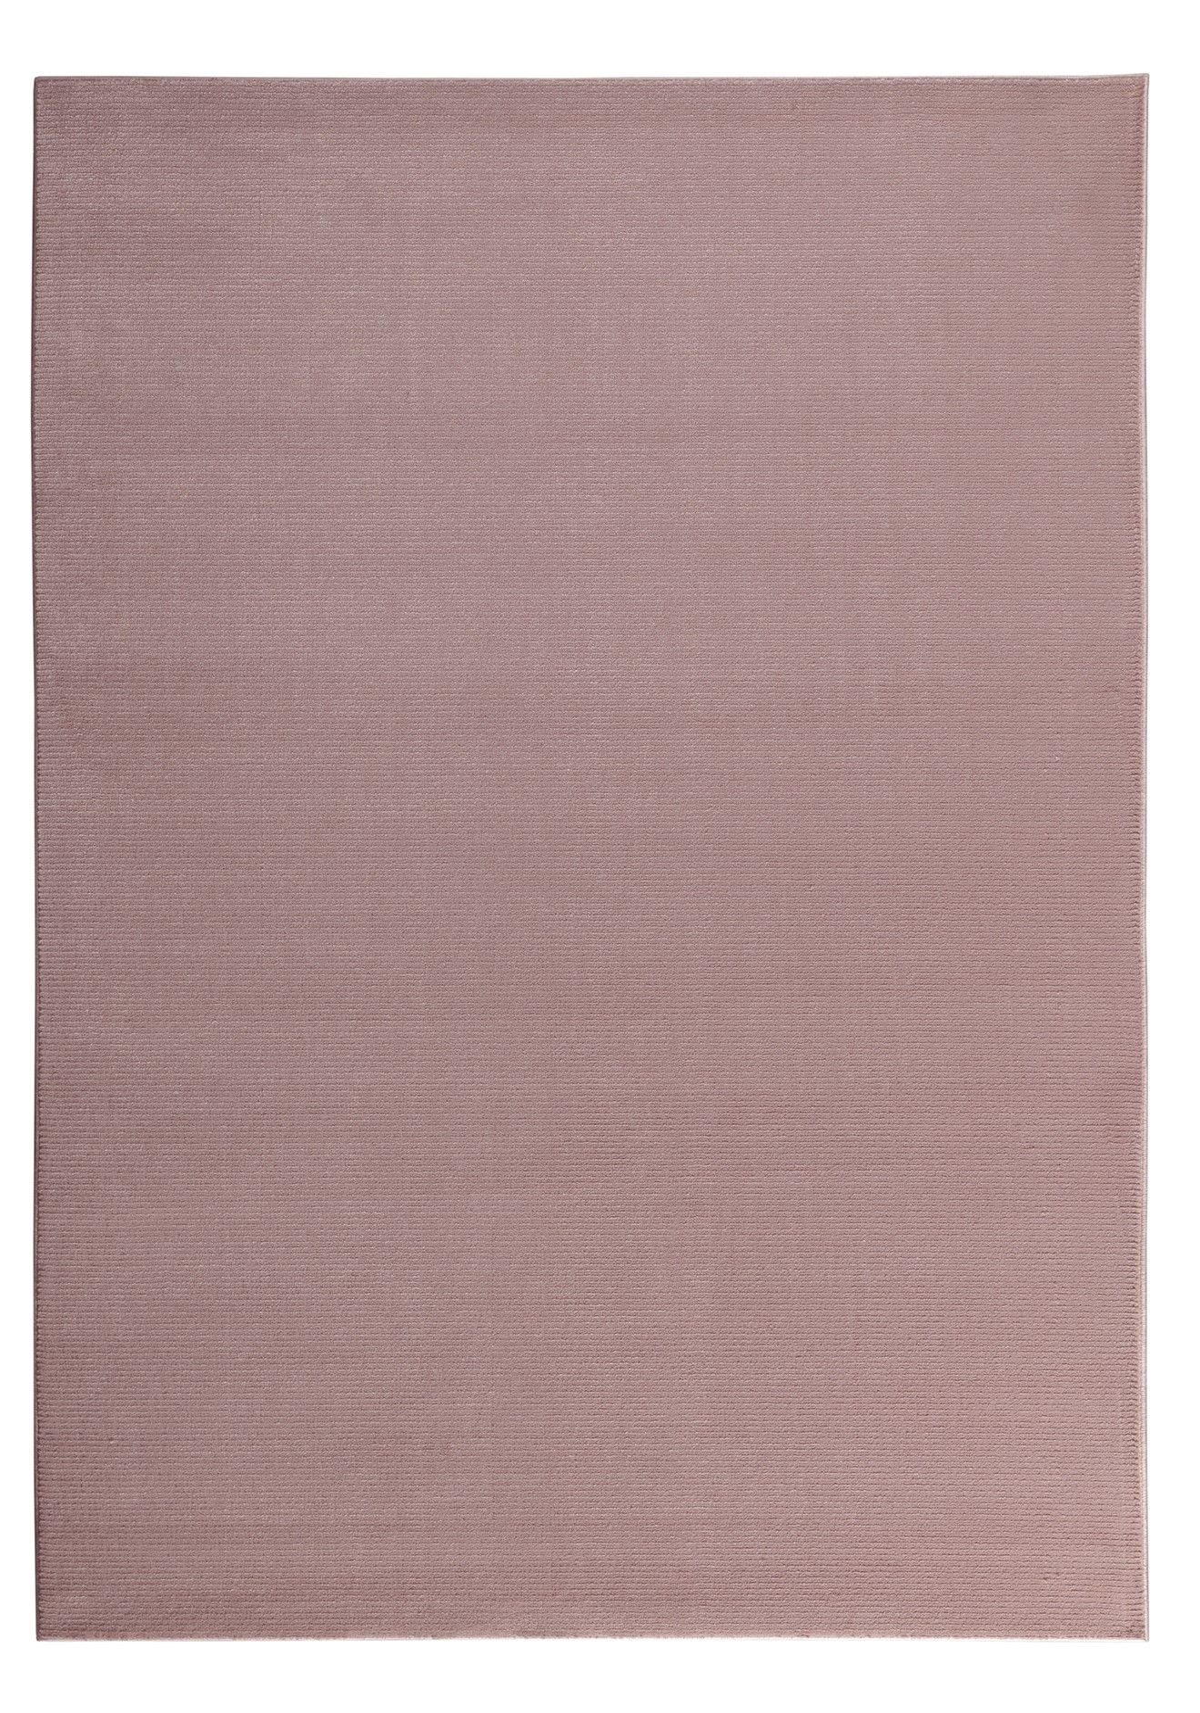 Tapis moderne uni doux rose 160x230